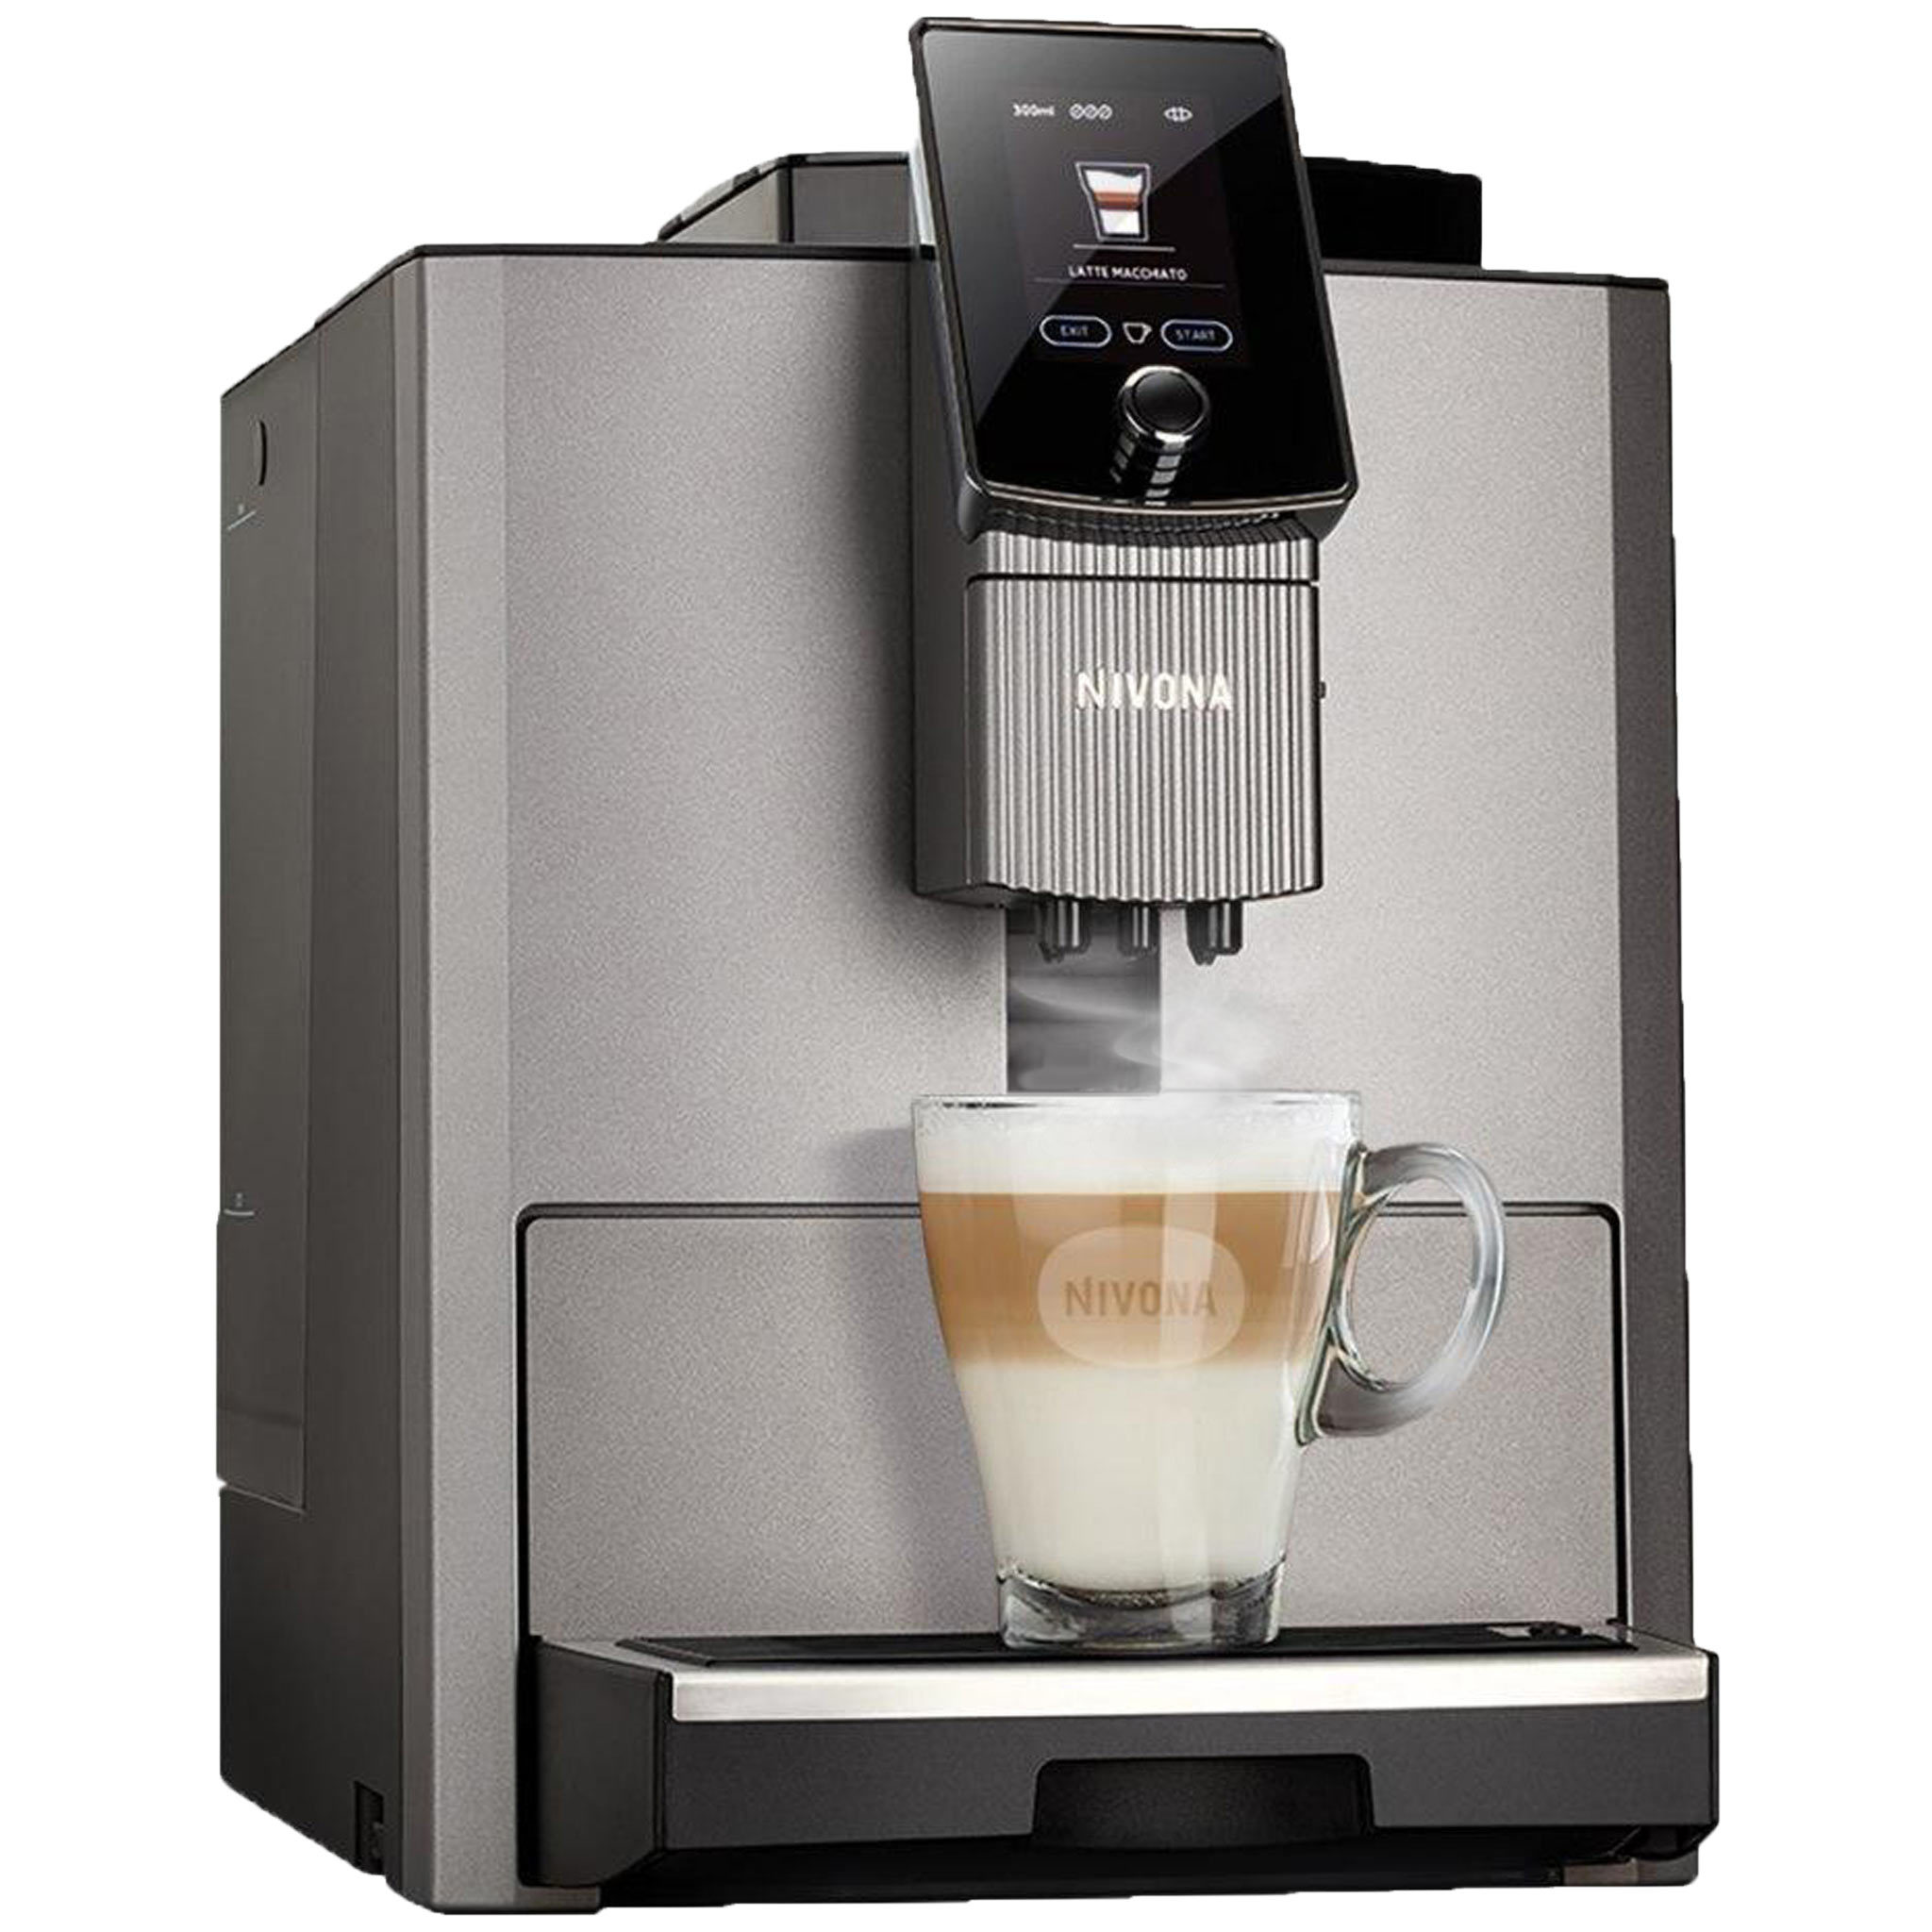 Кофемашина Nivona CafeRomatica NICR 1040